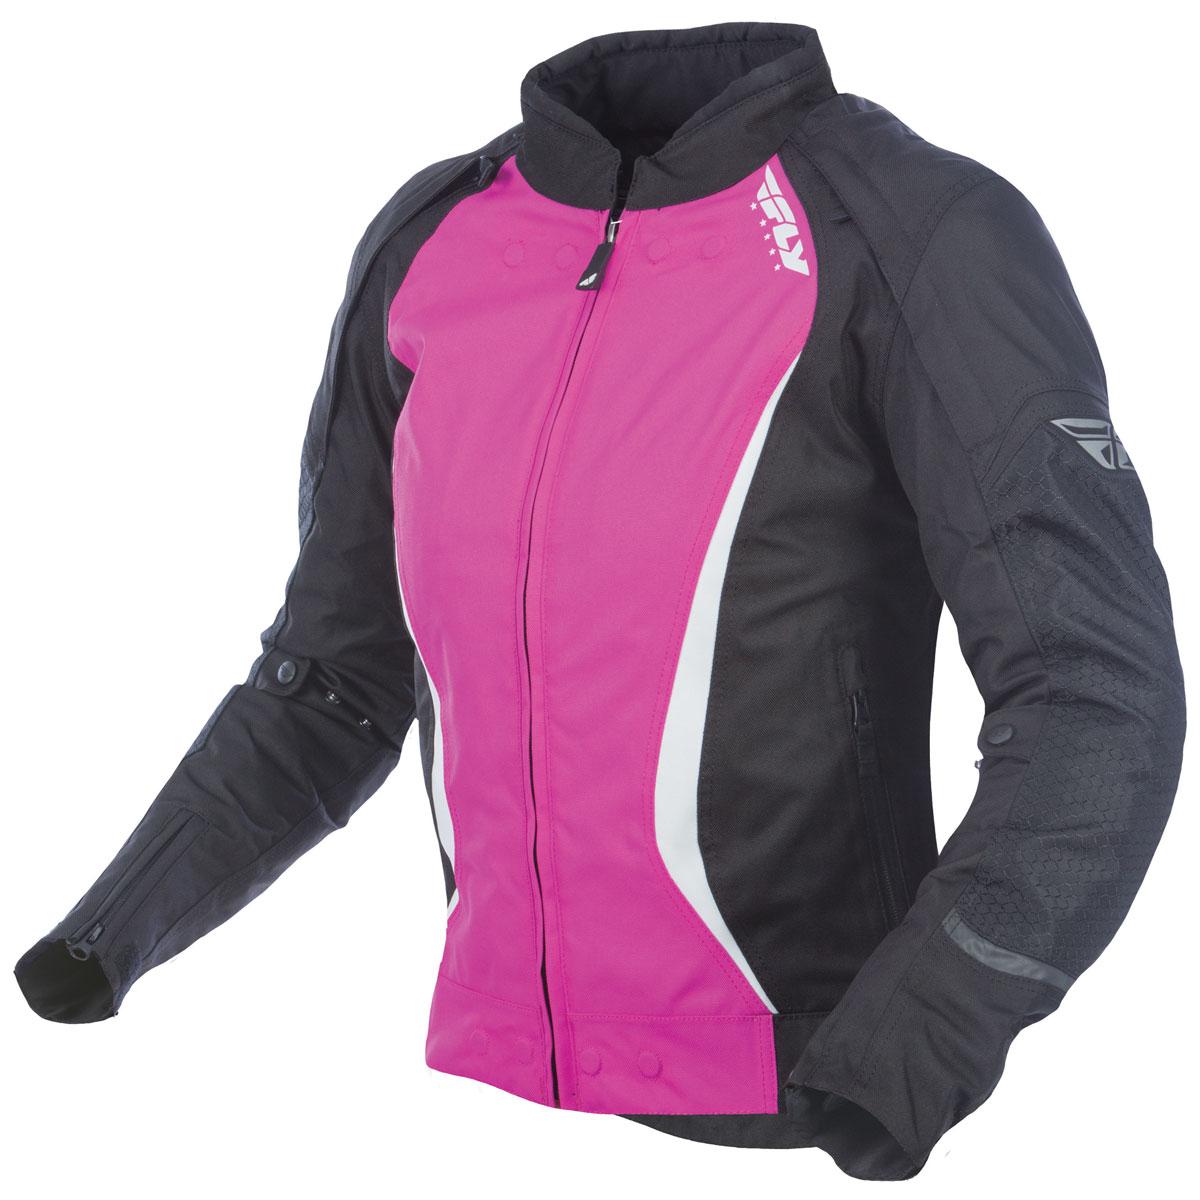 FLY Racing Street Women's Butane Black/Pink Jacket